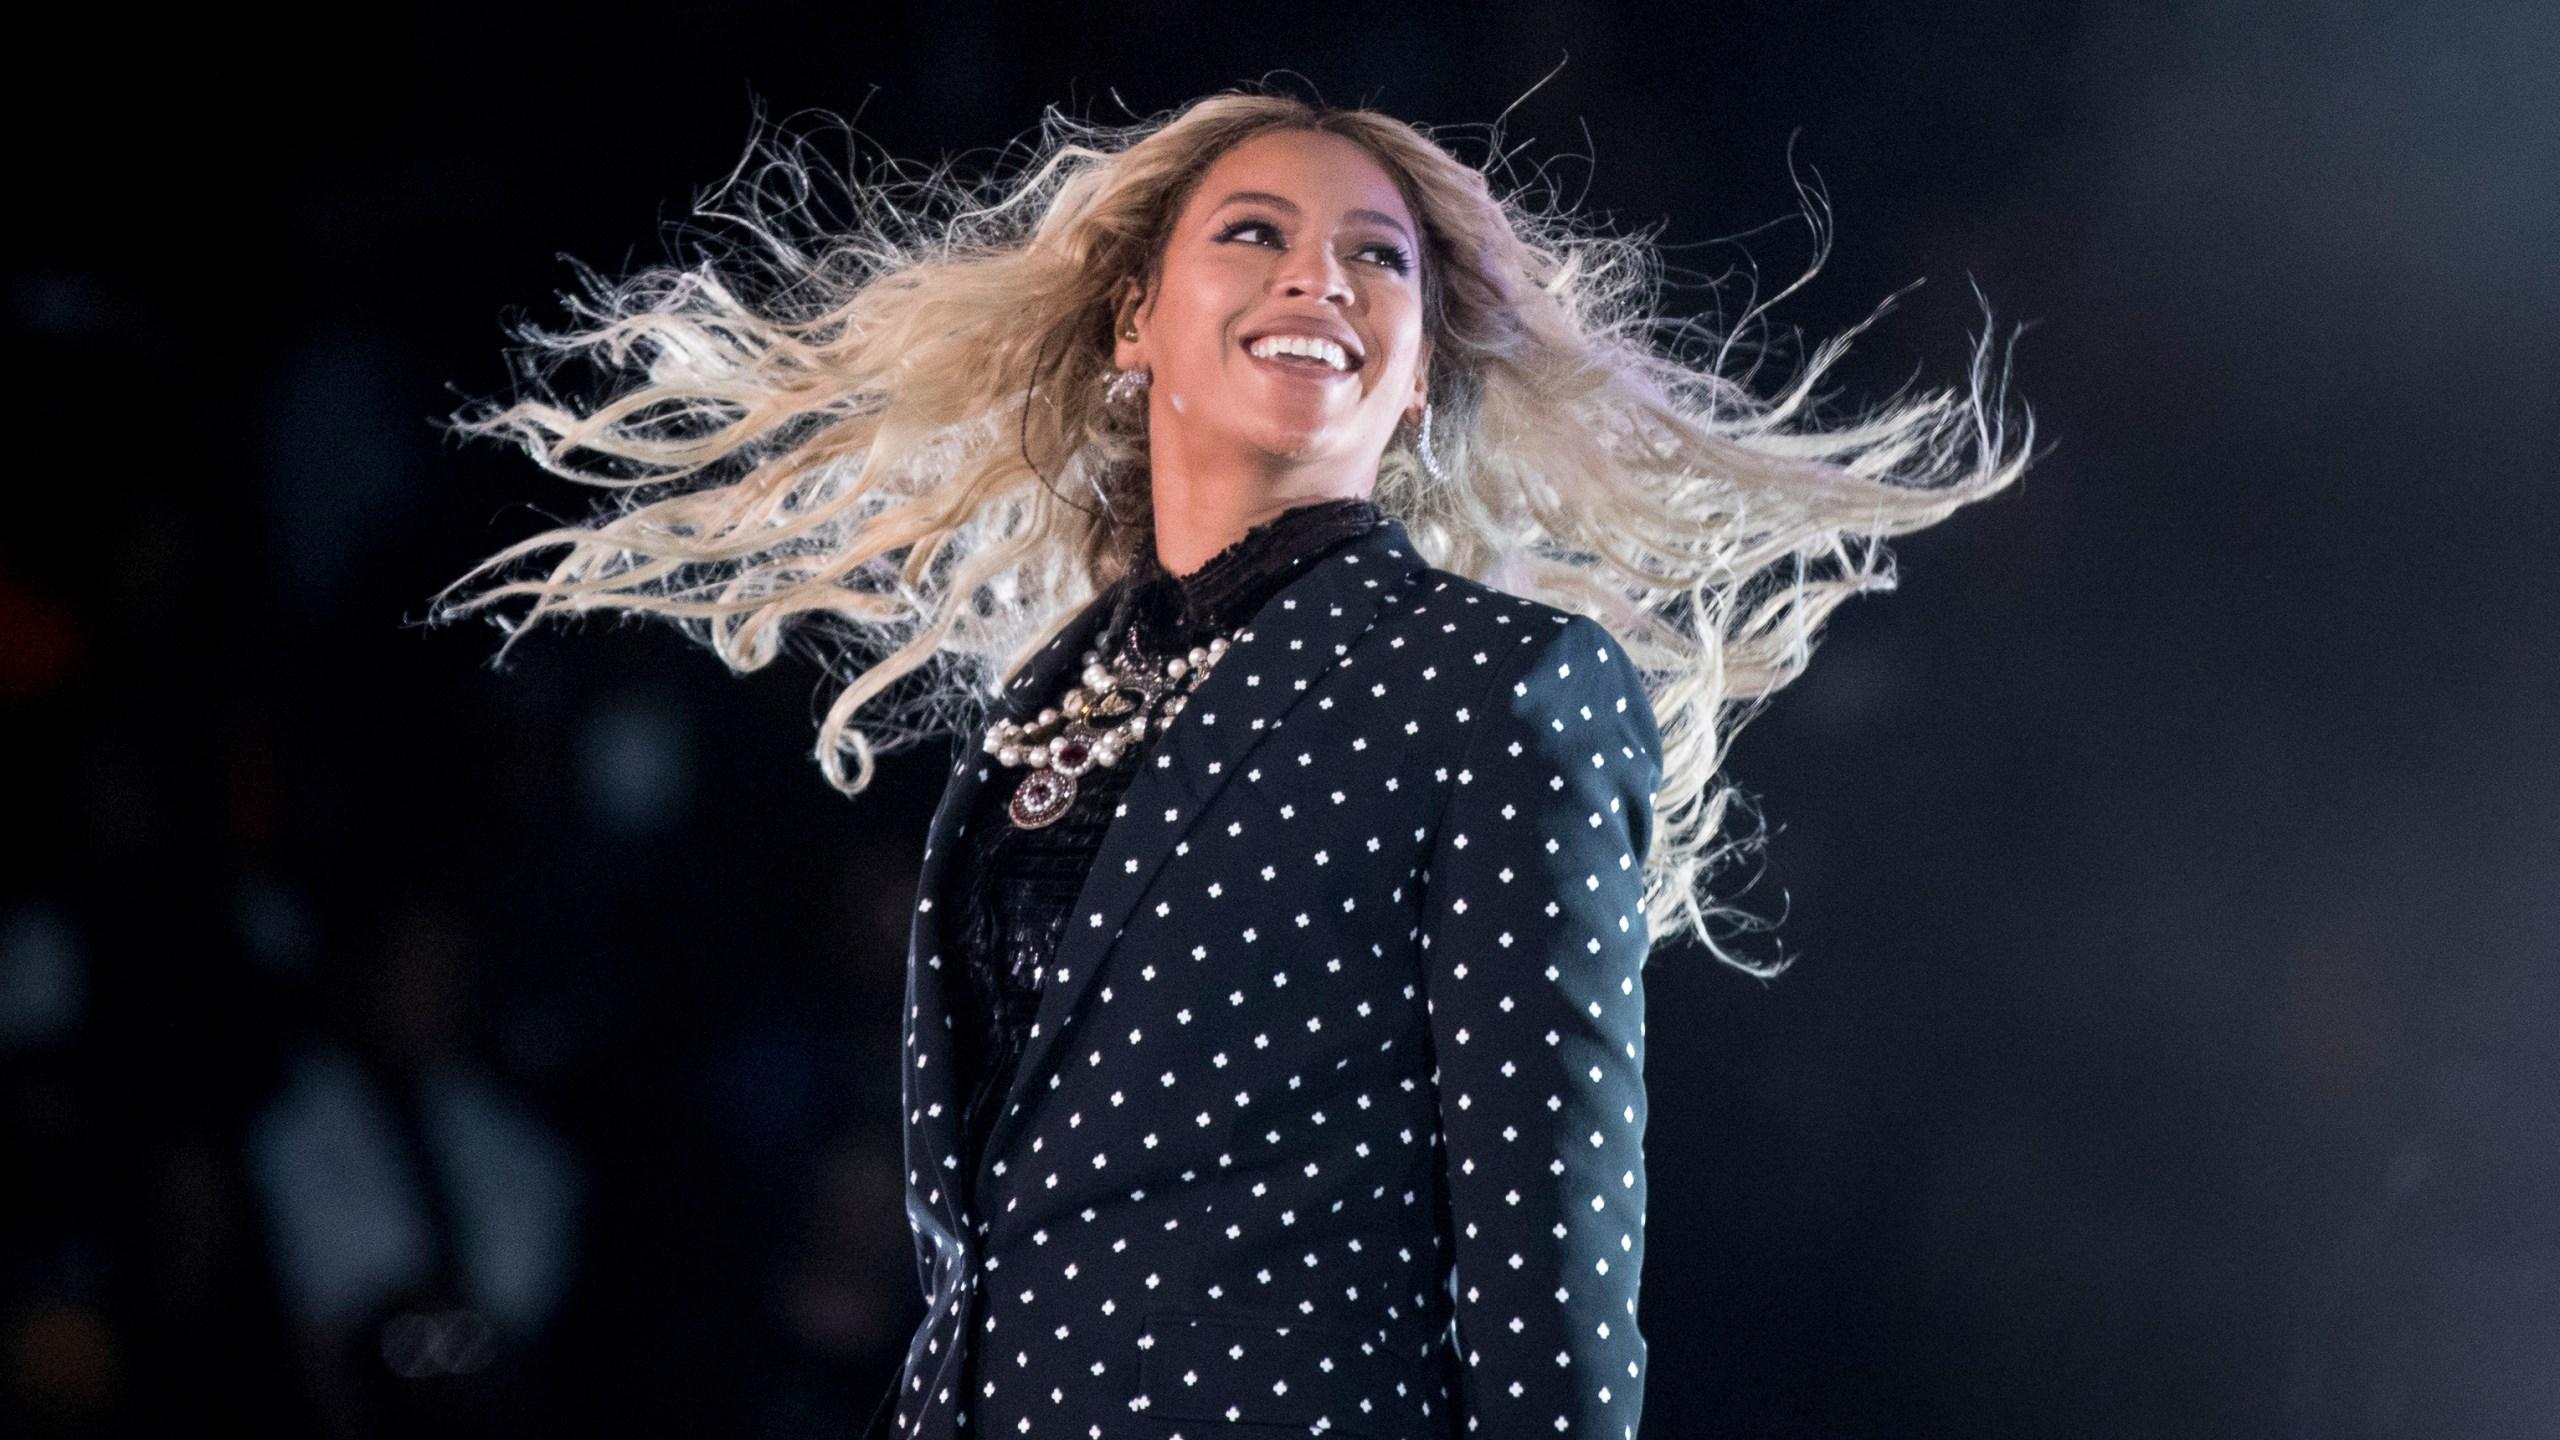 Music_Jay-Z-Beyonce_Album_22387-159532.jpg94098300